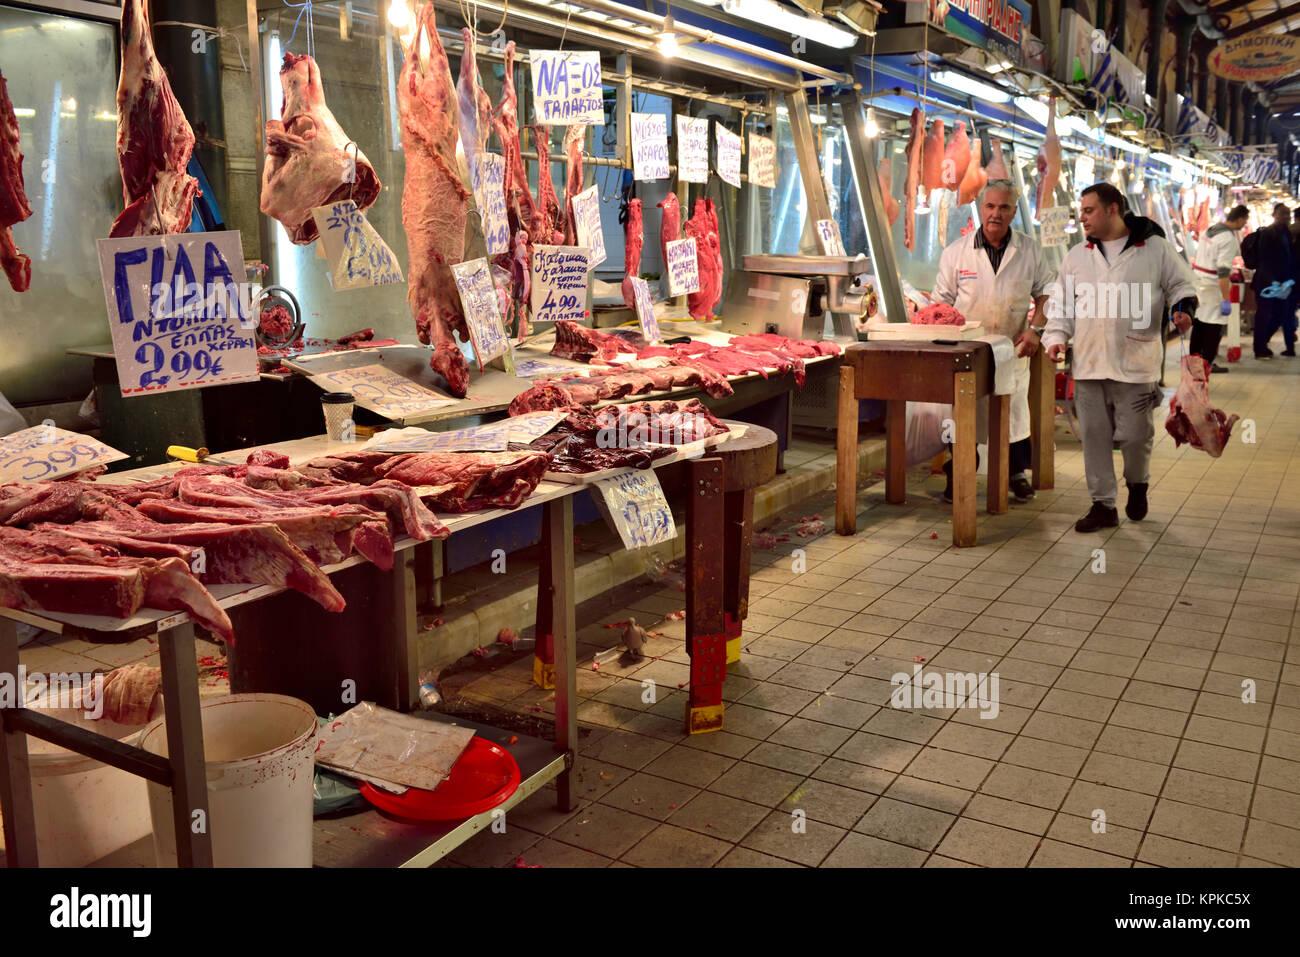 meat market stock photos meat market stock images alamy. Black Bedroom Furniture Sets. Home Design Ideas